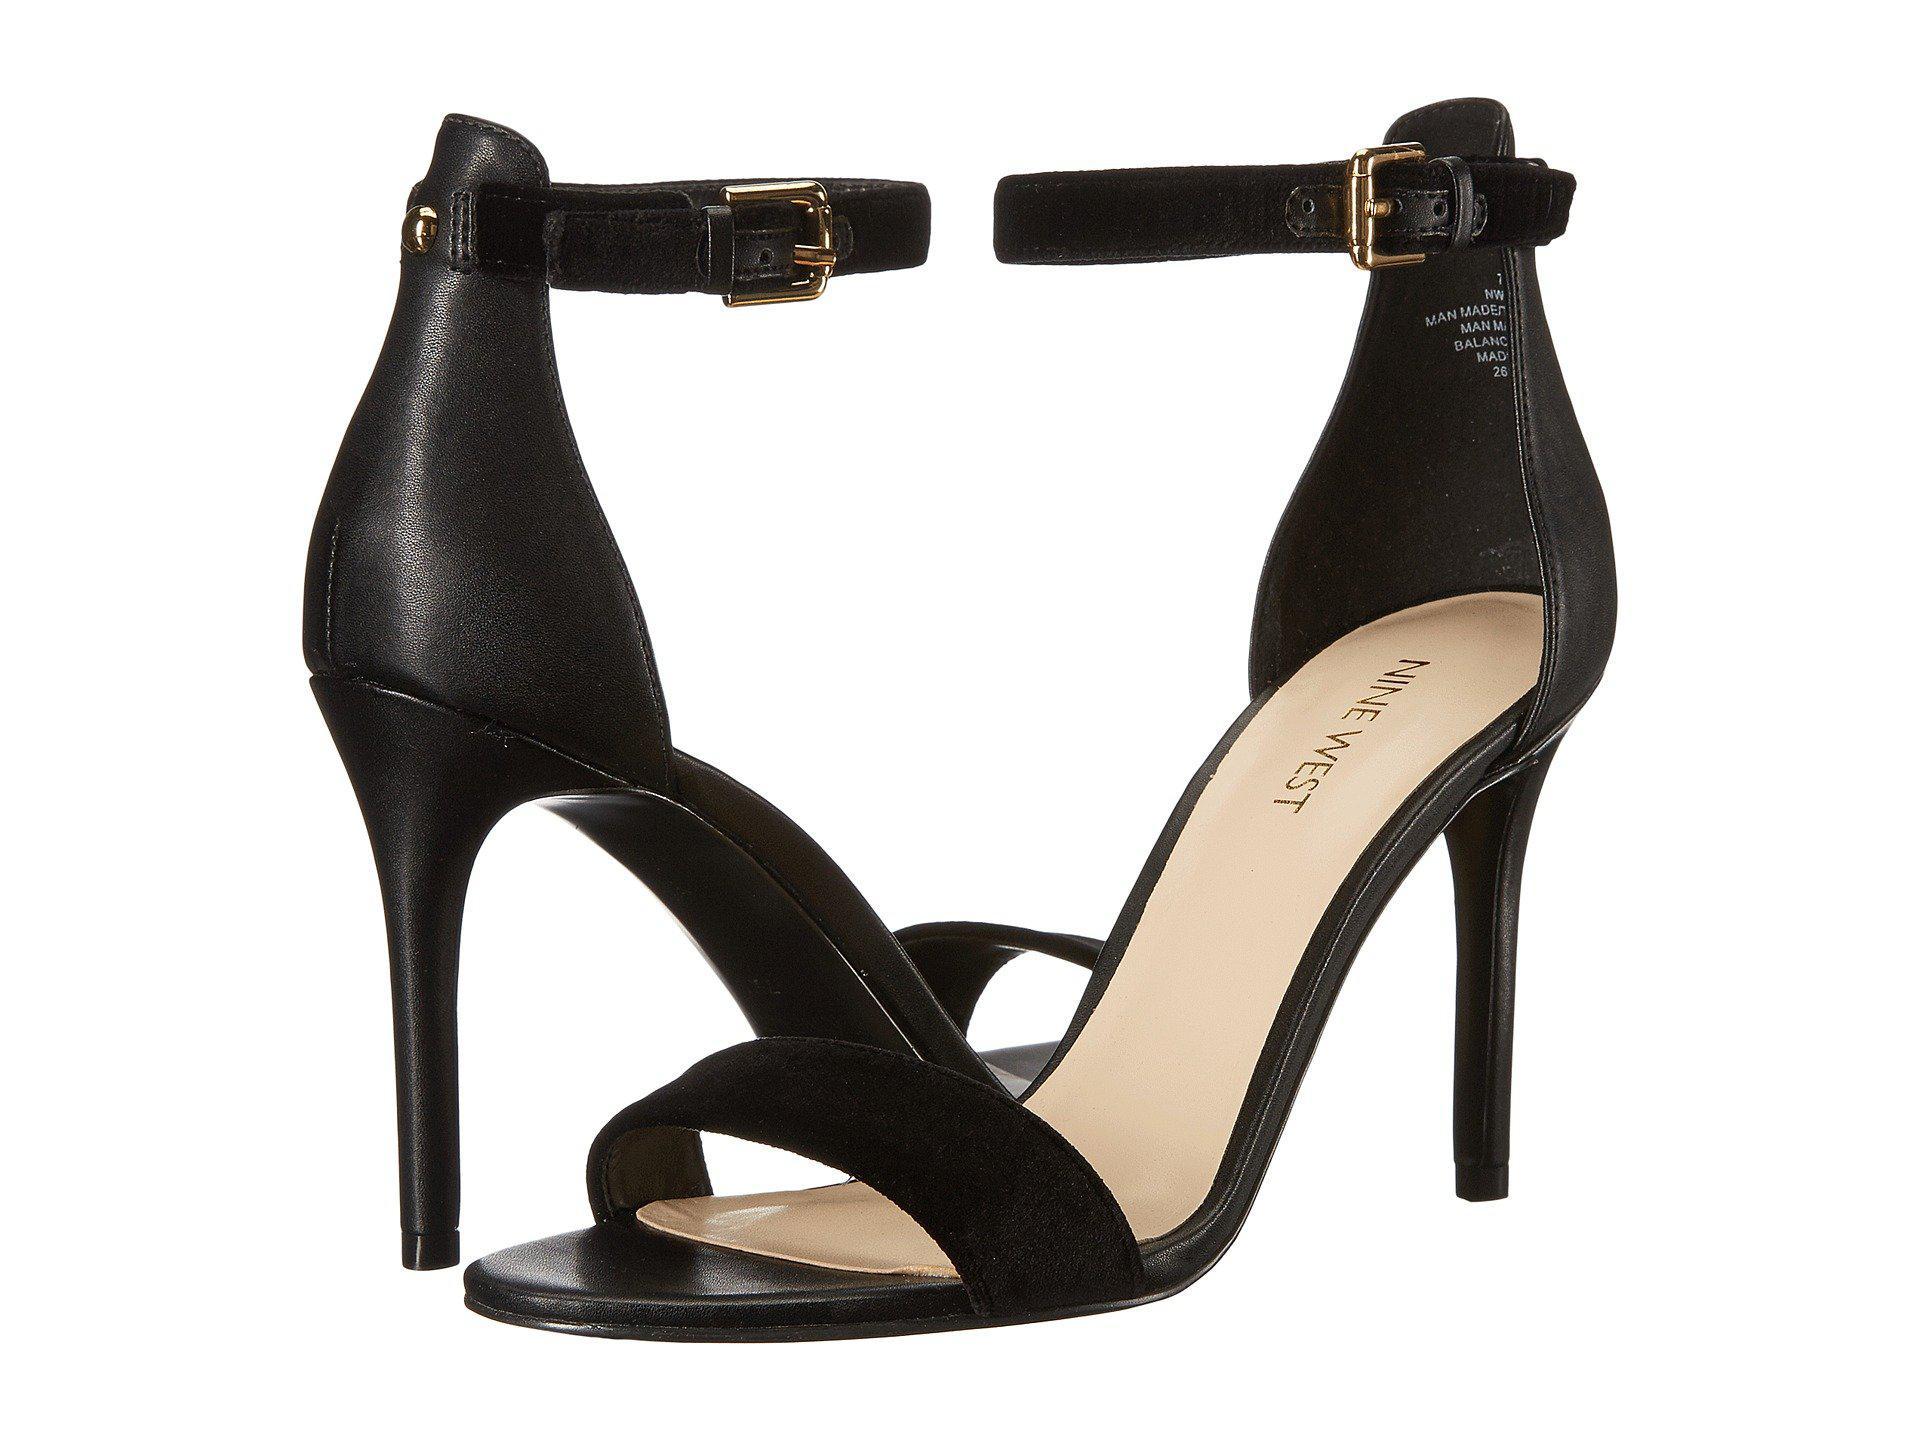 728ed58ded Nine West Mana Stiletto Heel Sandal in Black - Lyst